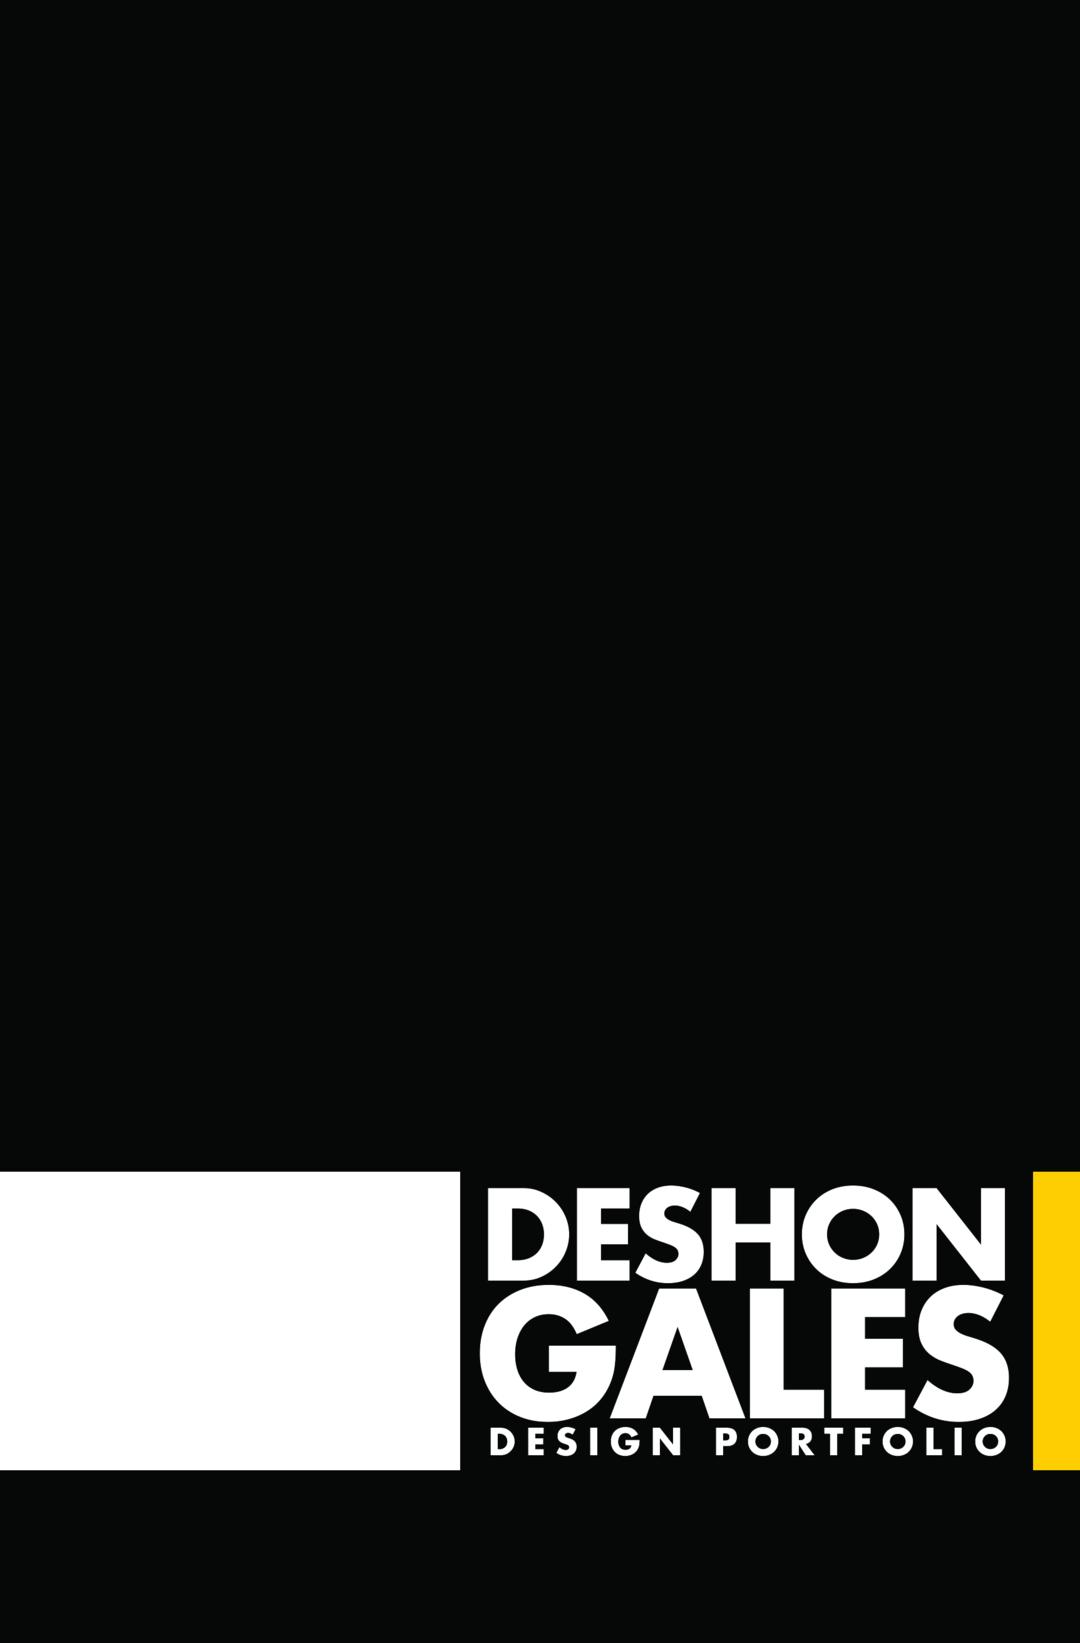 Page 1 of DeShon Gales Design Portfolio